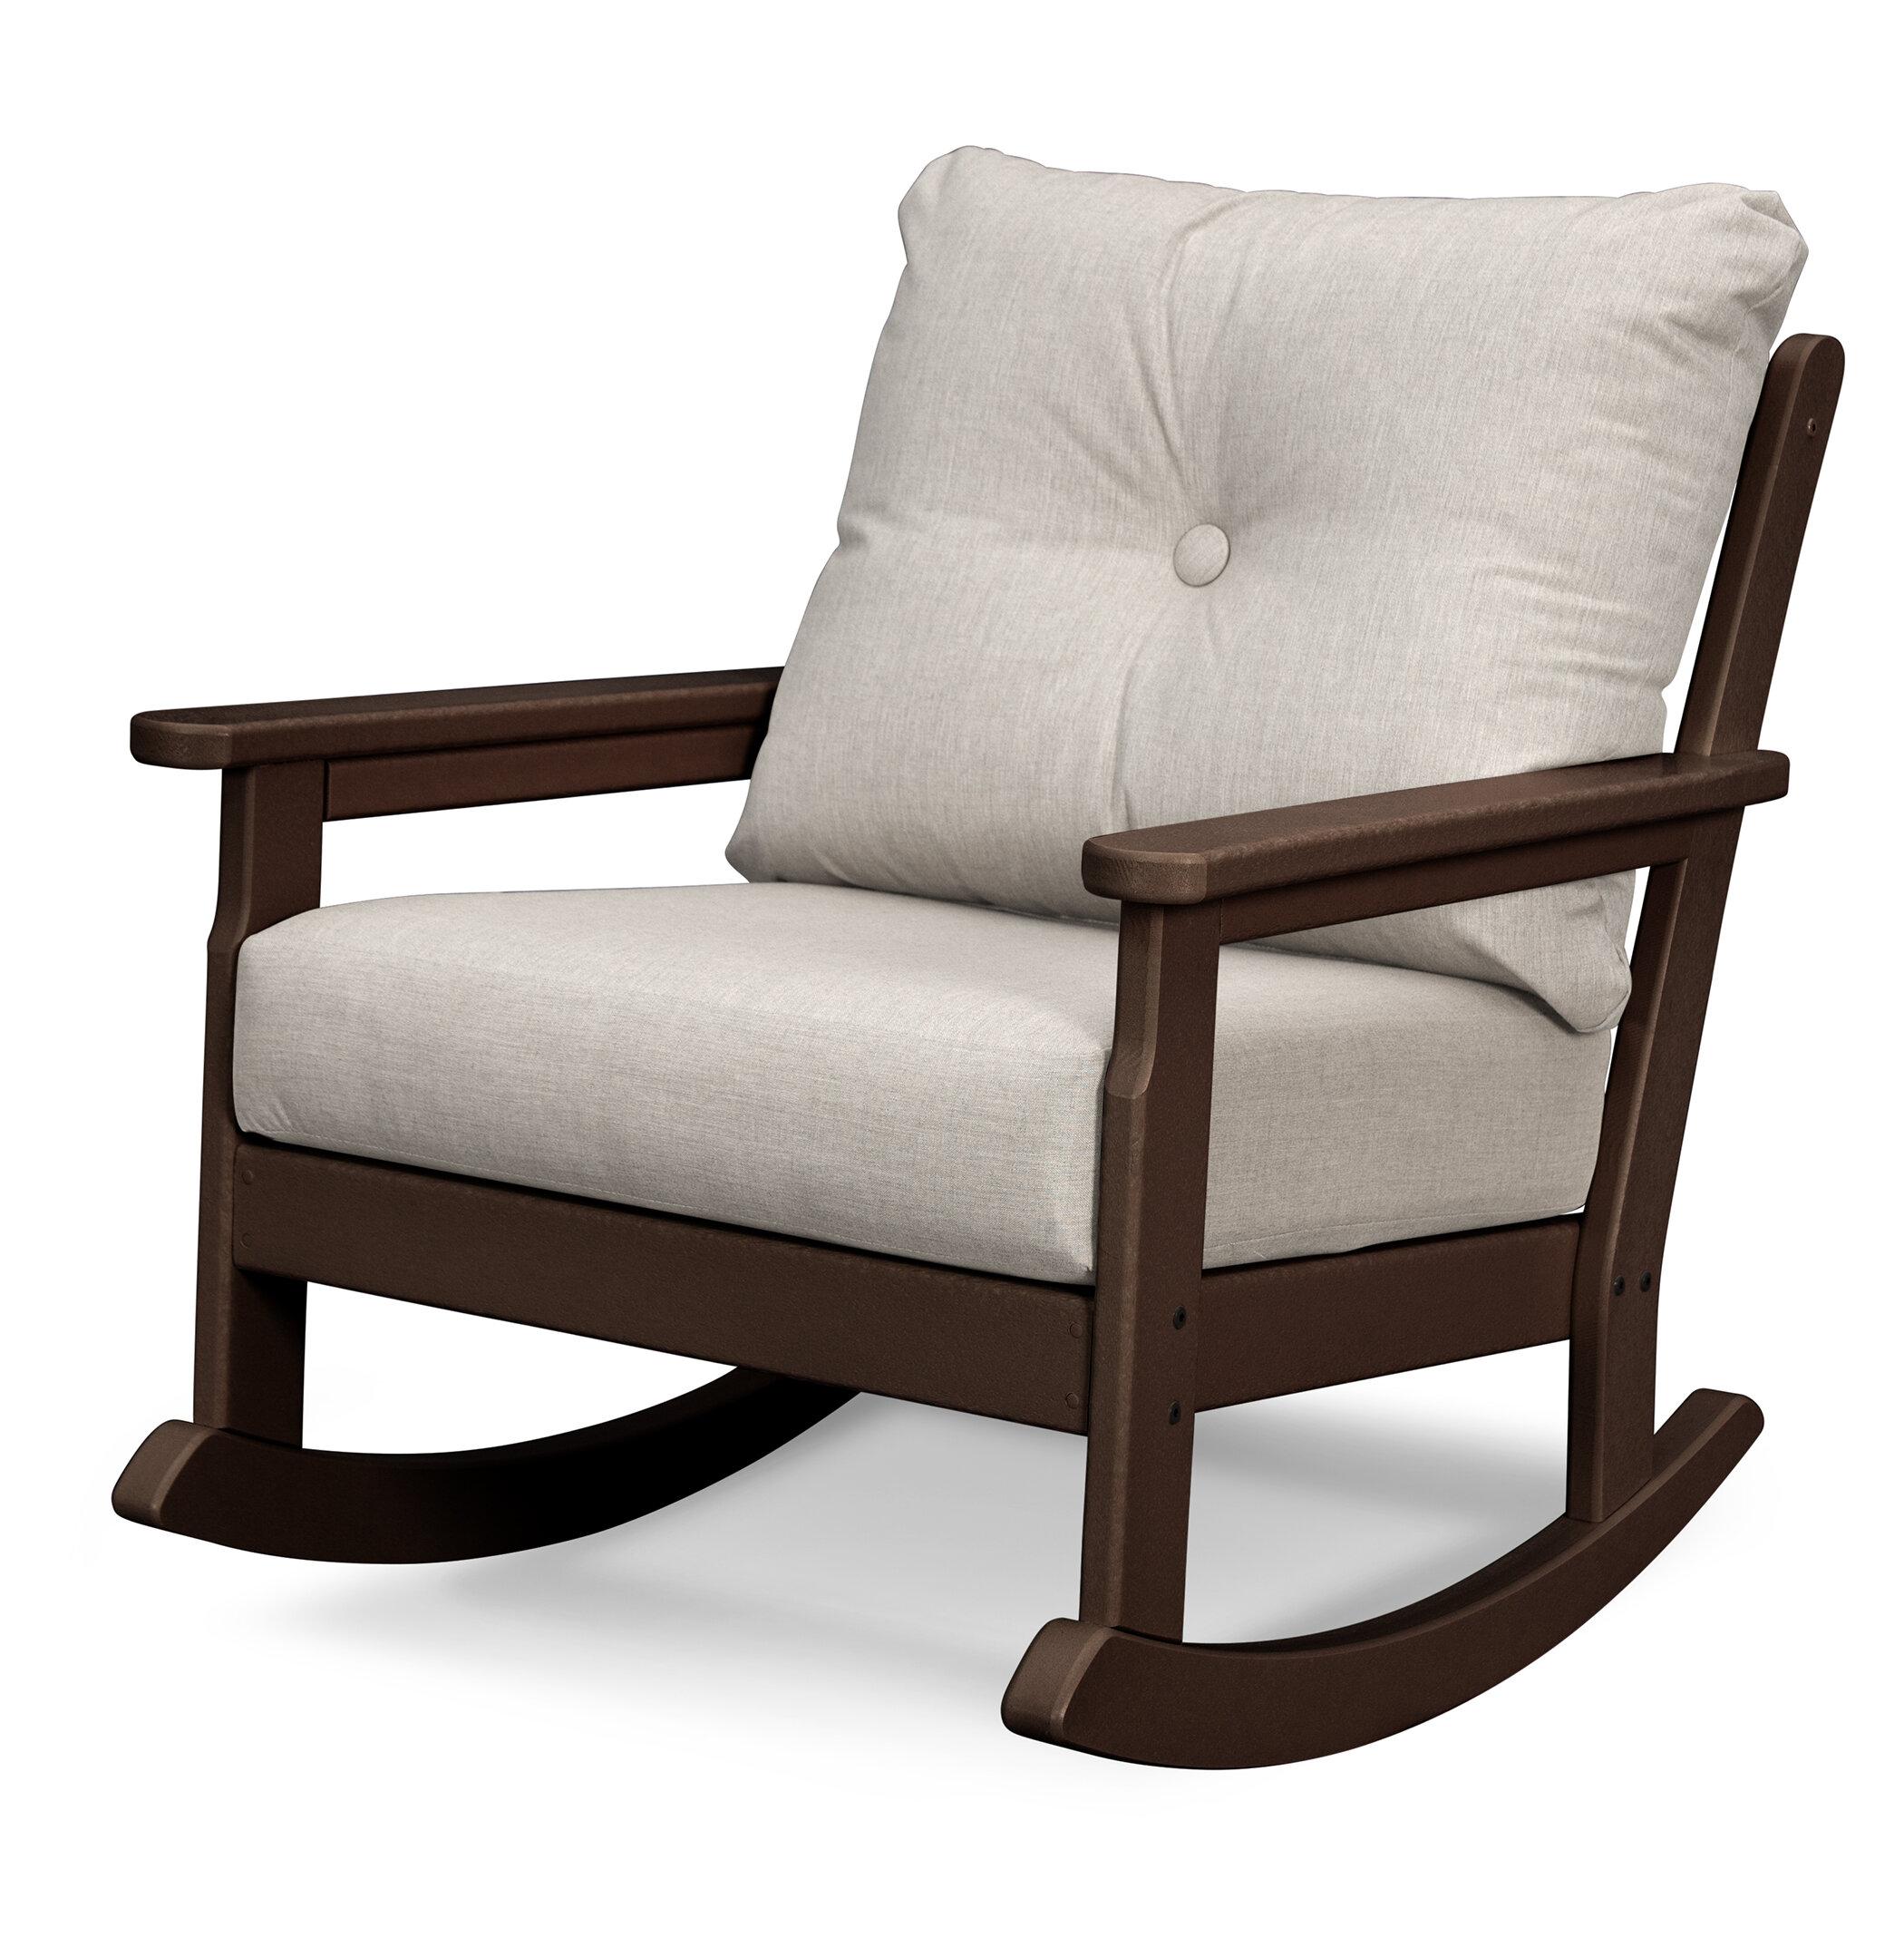 Vineyard Deep Seating Rocking Chair With Cushions